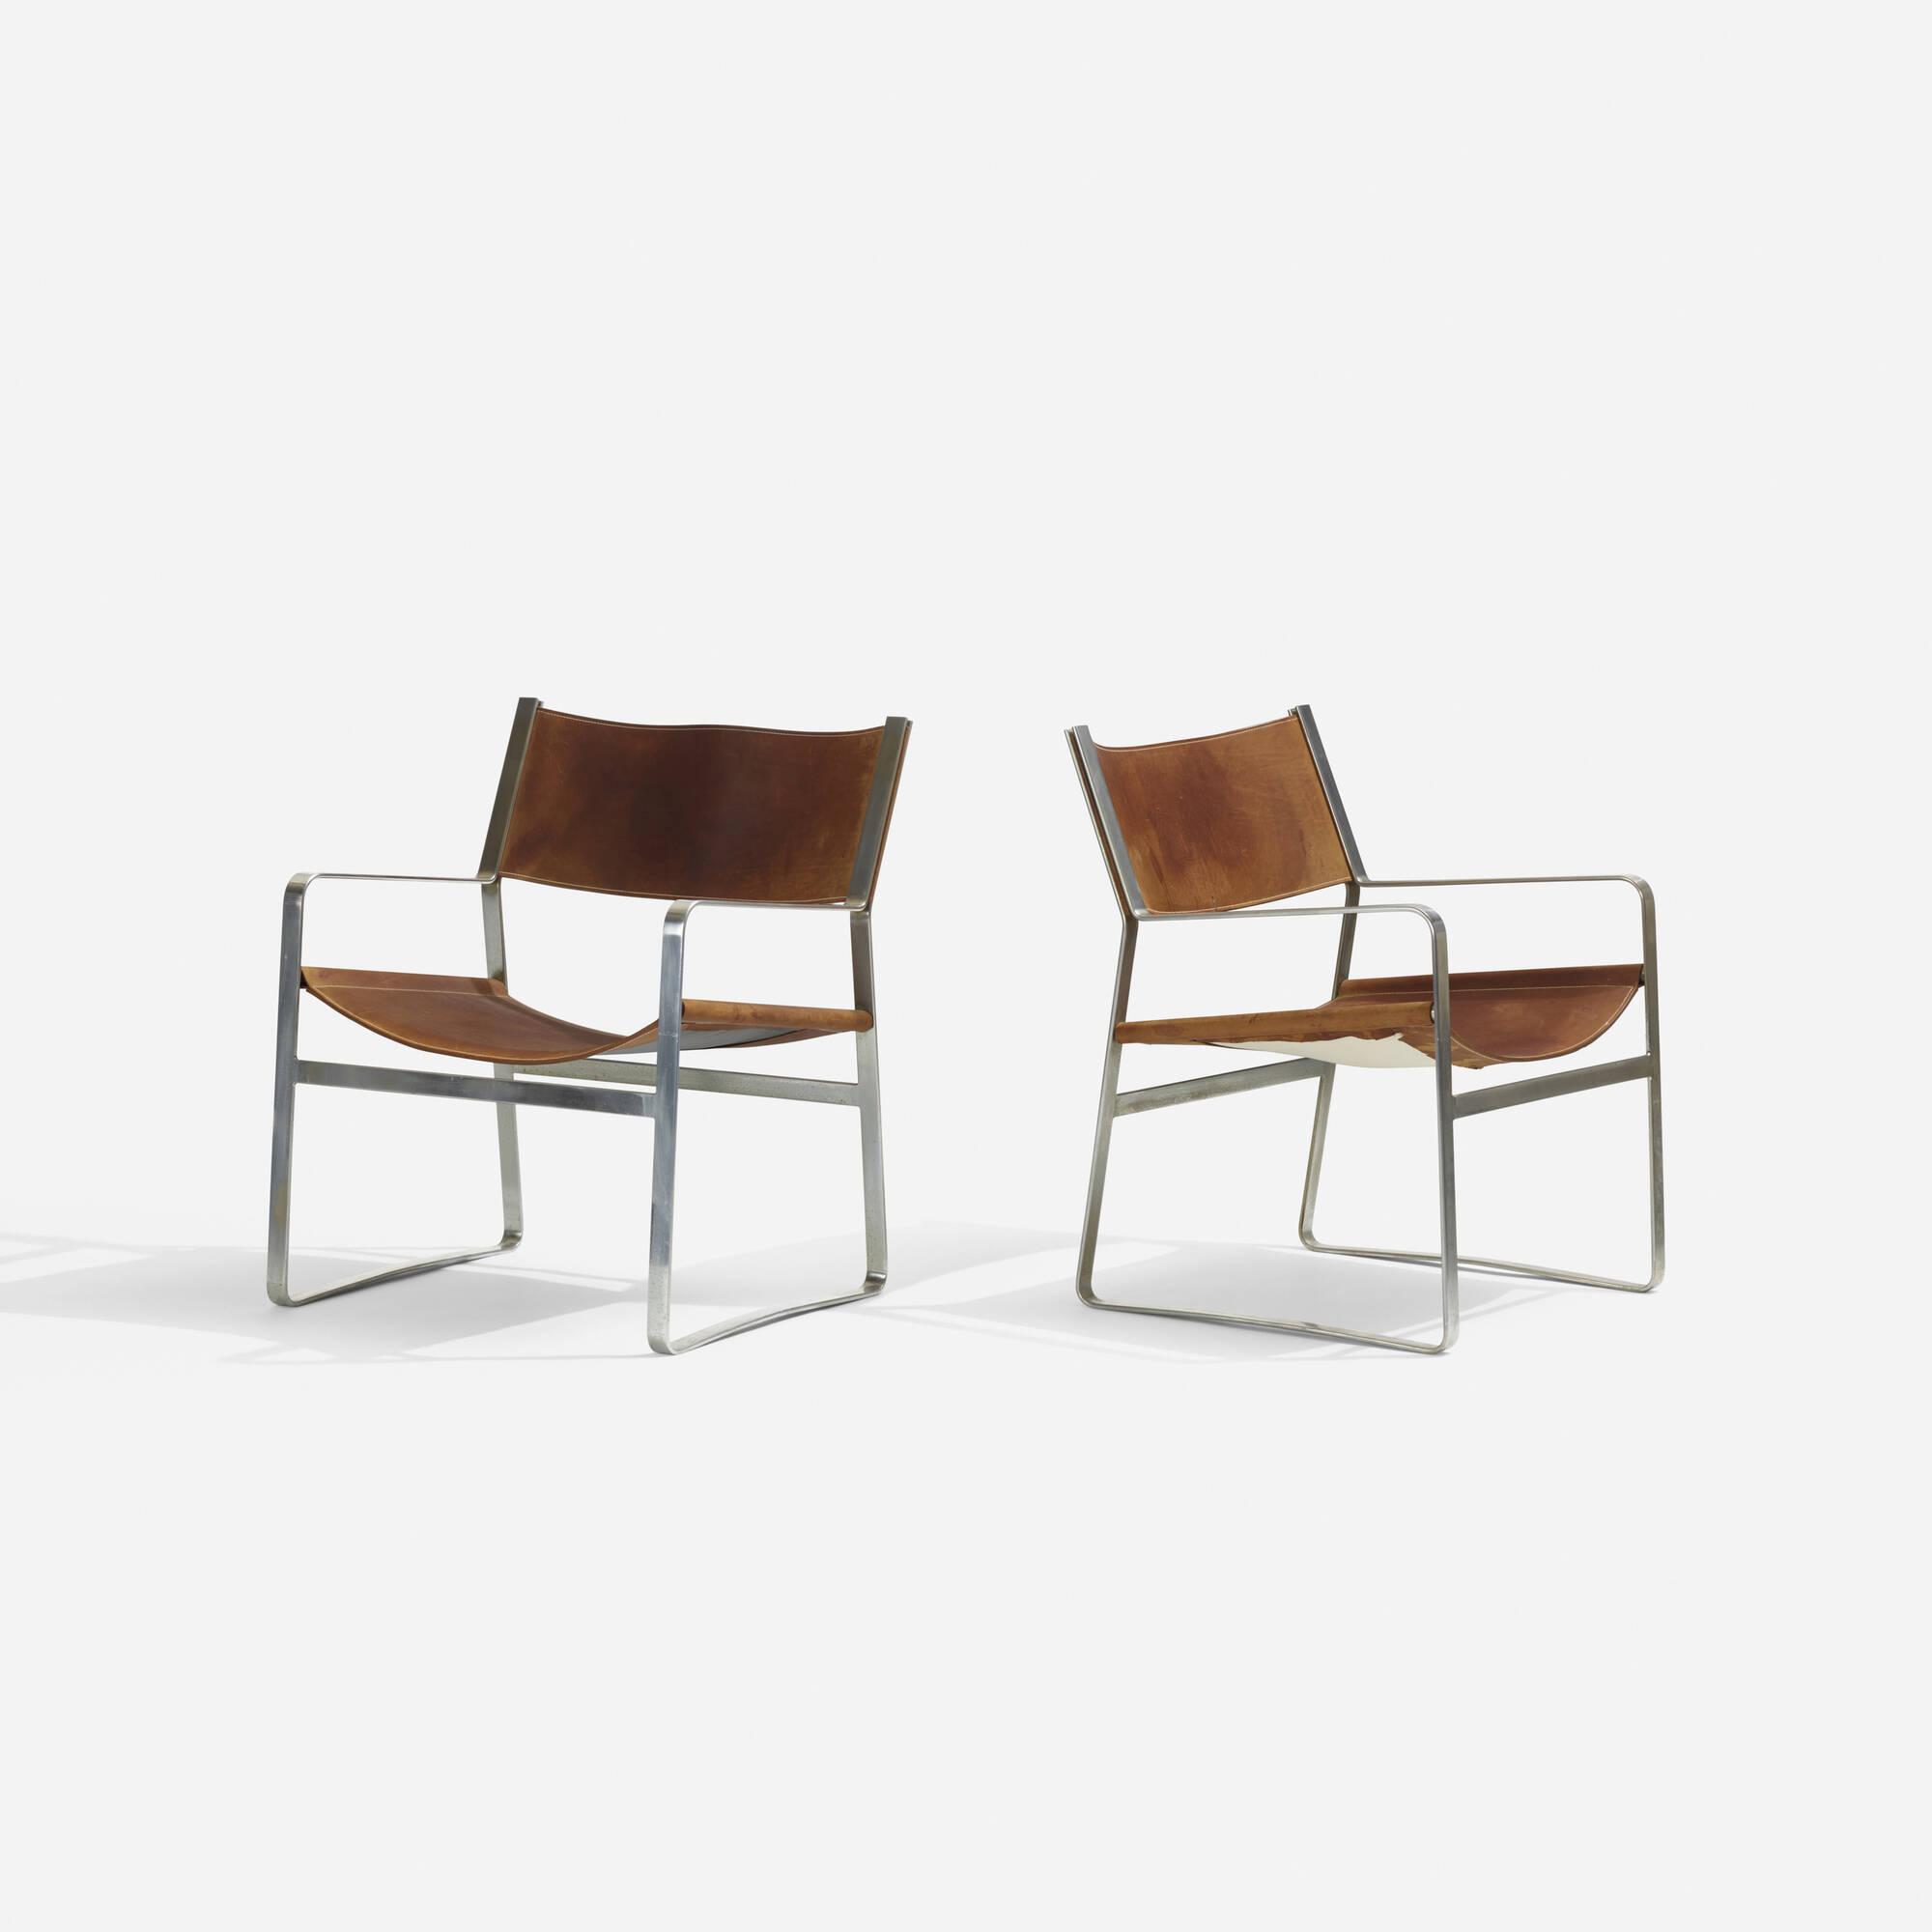 136: Hans J. Wegner / armchairs model JH 812, pair (2 of 2)